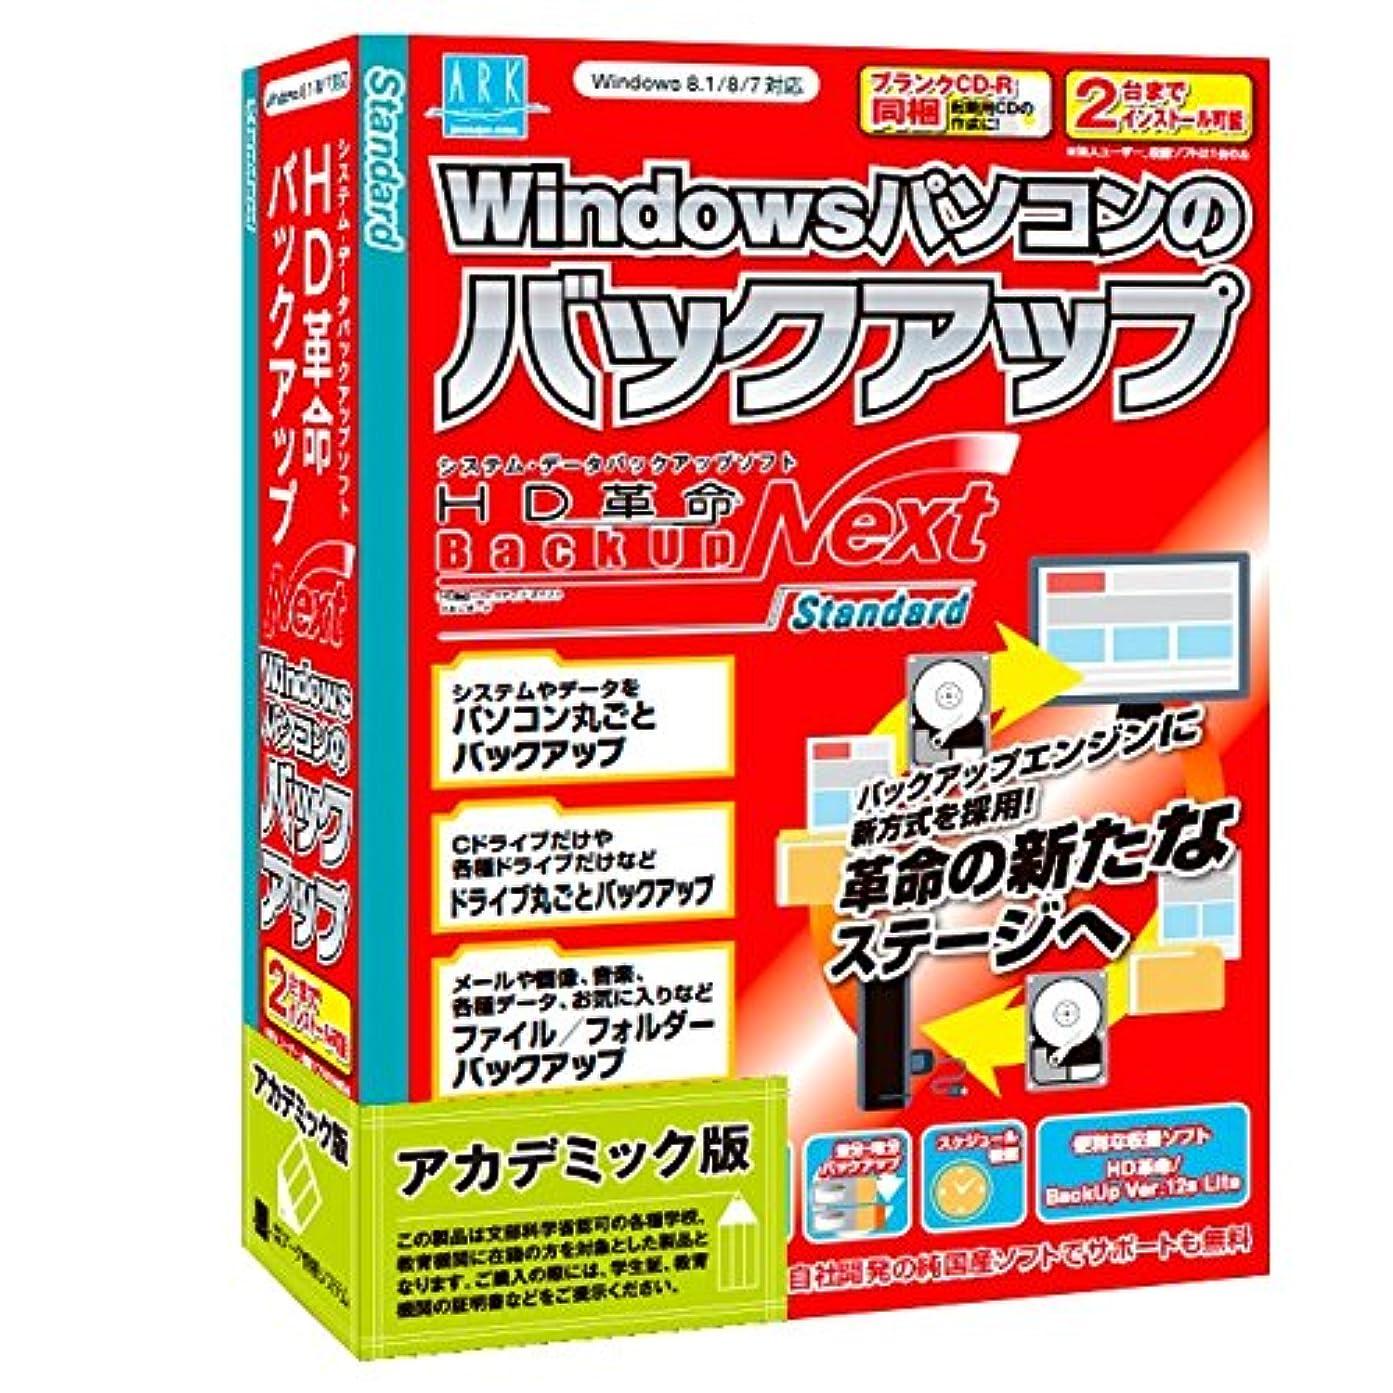 HD革命/BackUp Next Standard アカデミック版